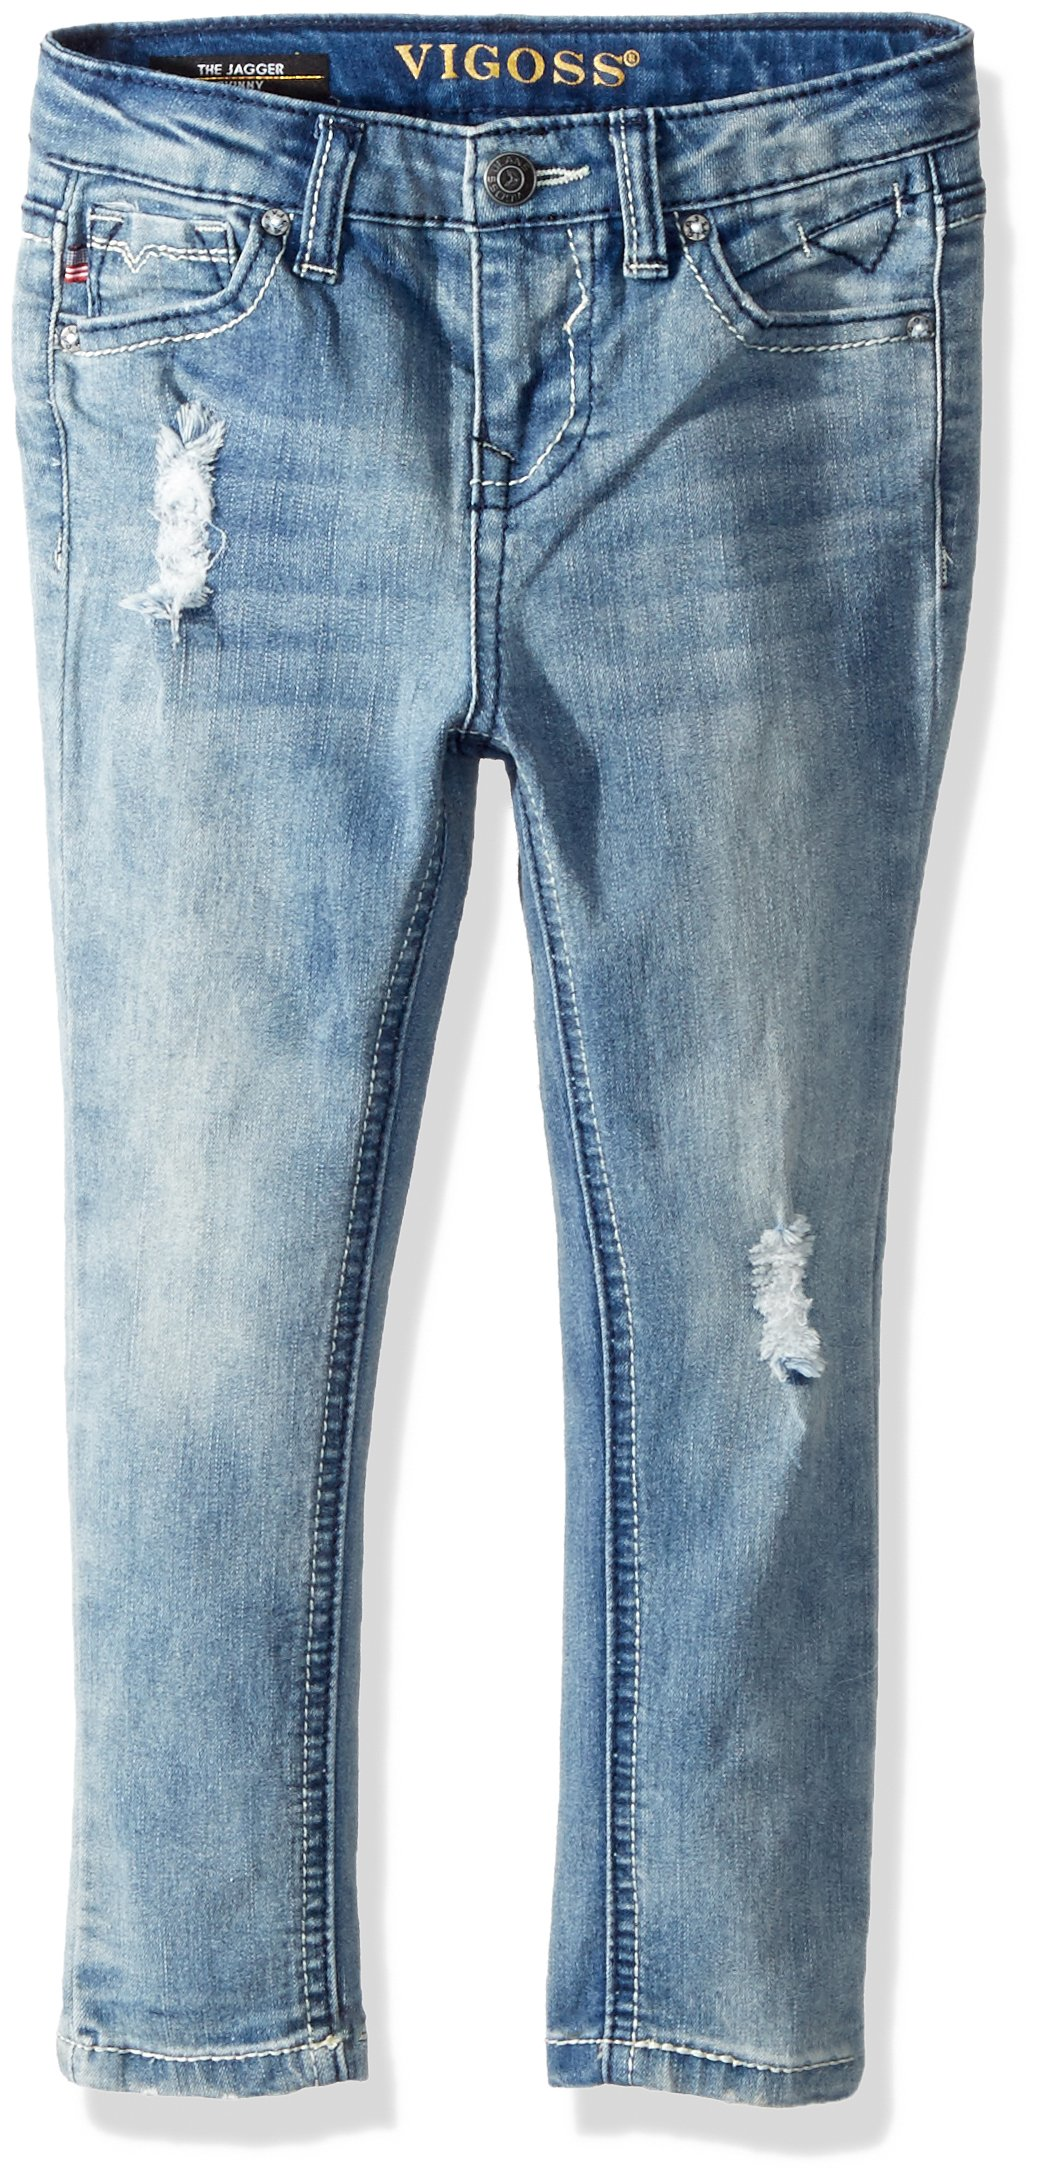 VIGOSS Girls' Big Back Pocket Jean, Brite Blue, 12